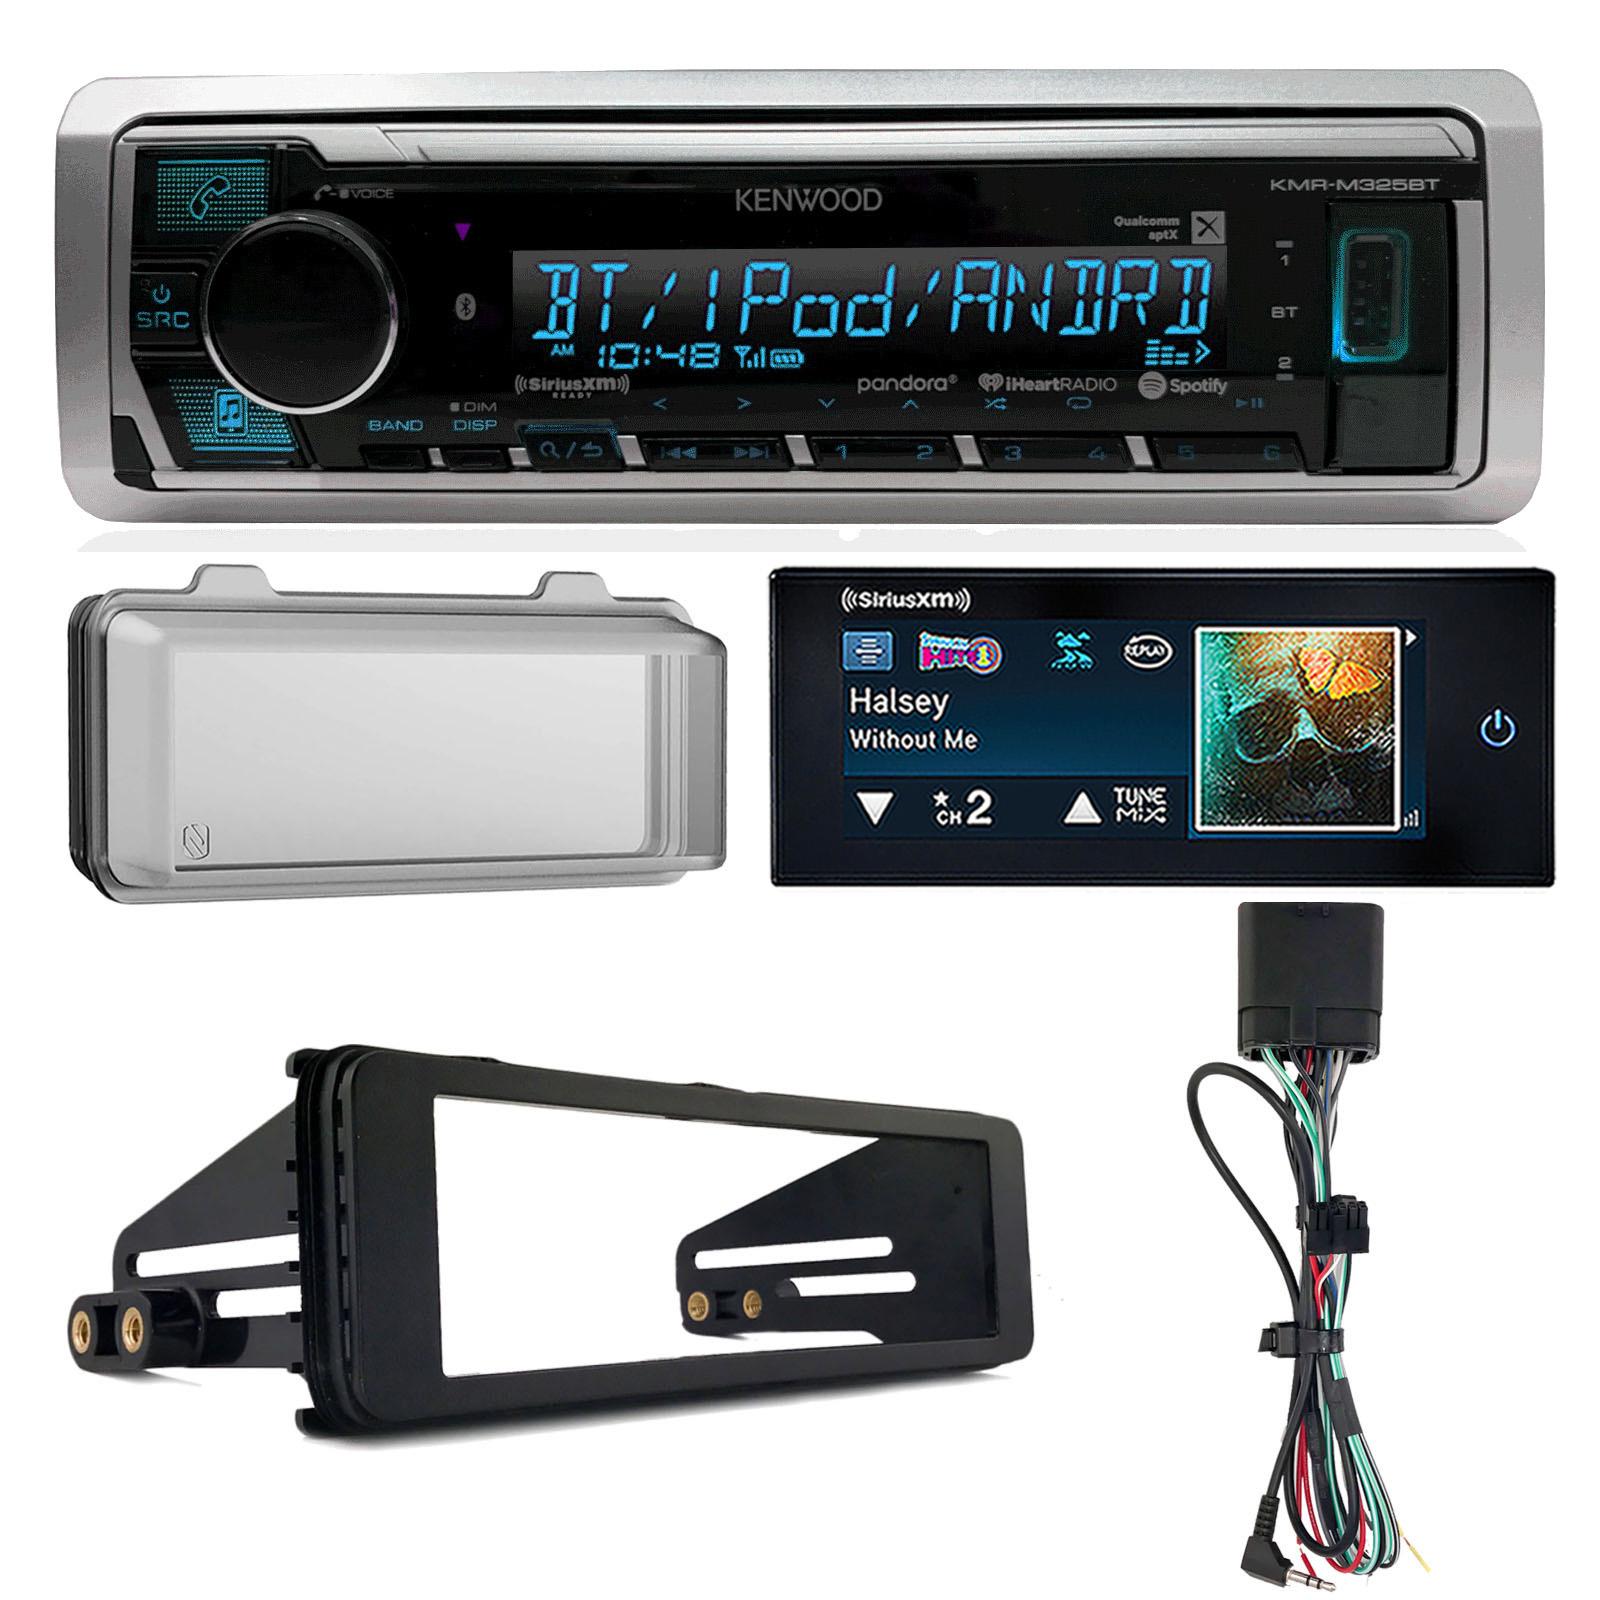 Harley Touring Marine Kenwood KMR-M325BT Bluetooth Radio Stereo Adapter Kit